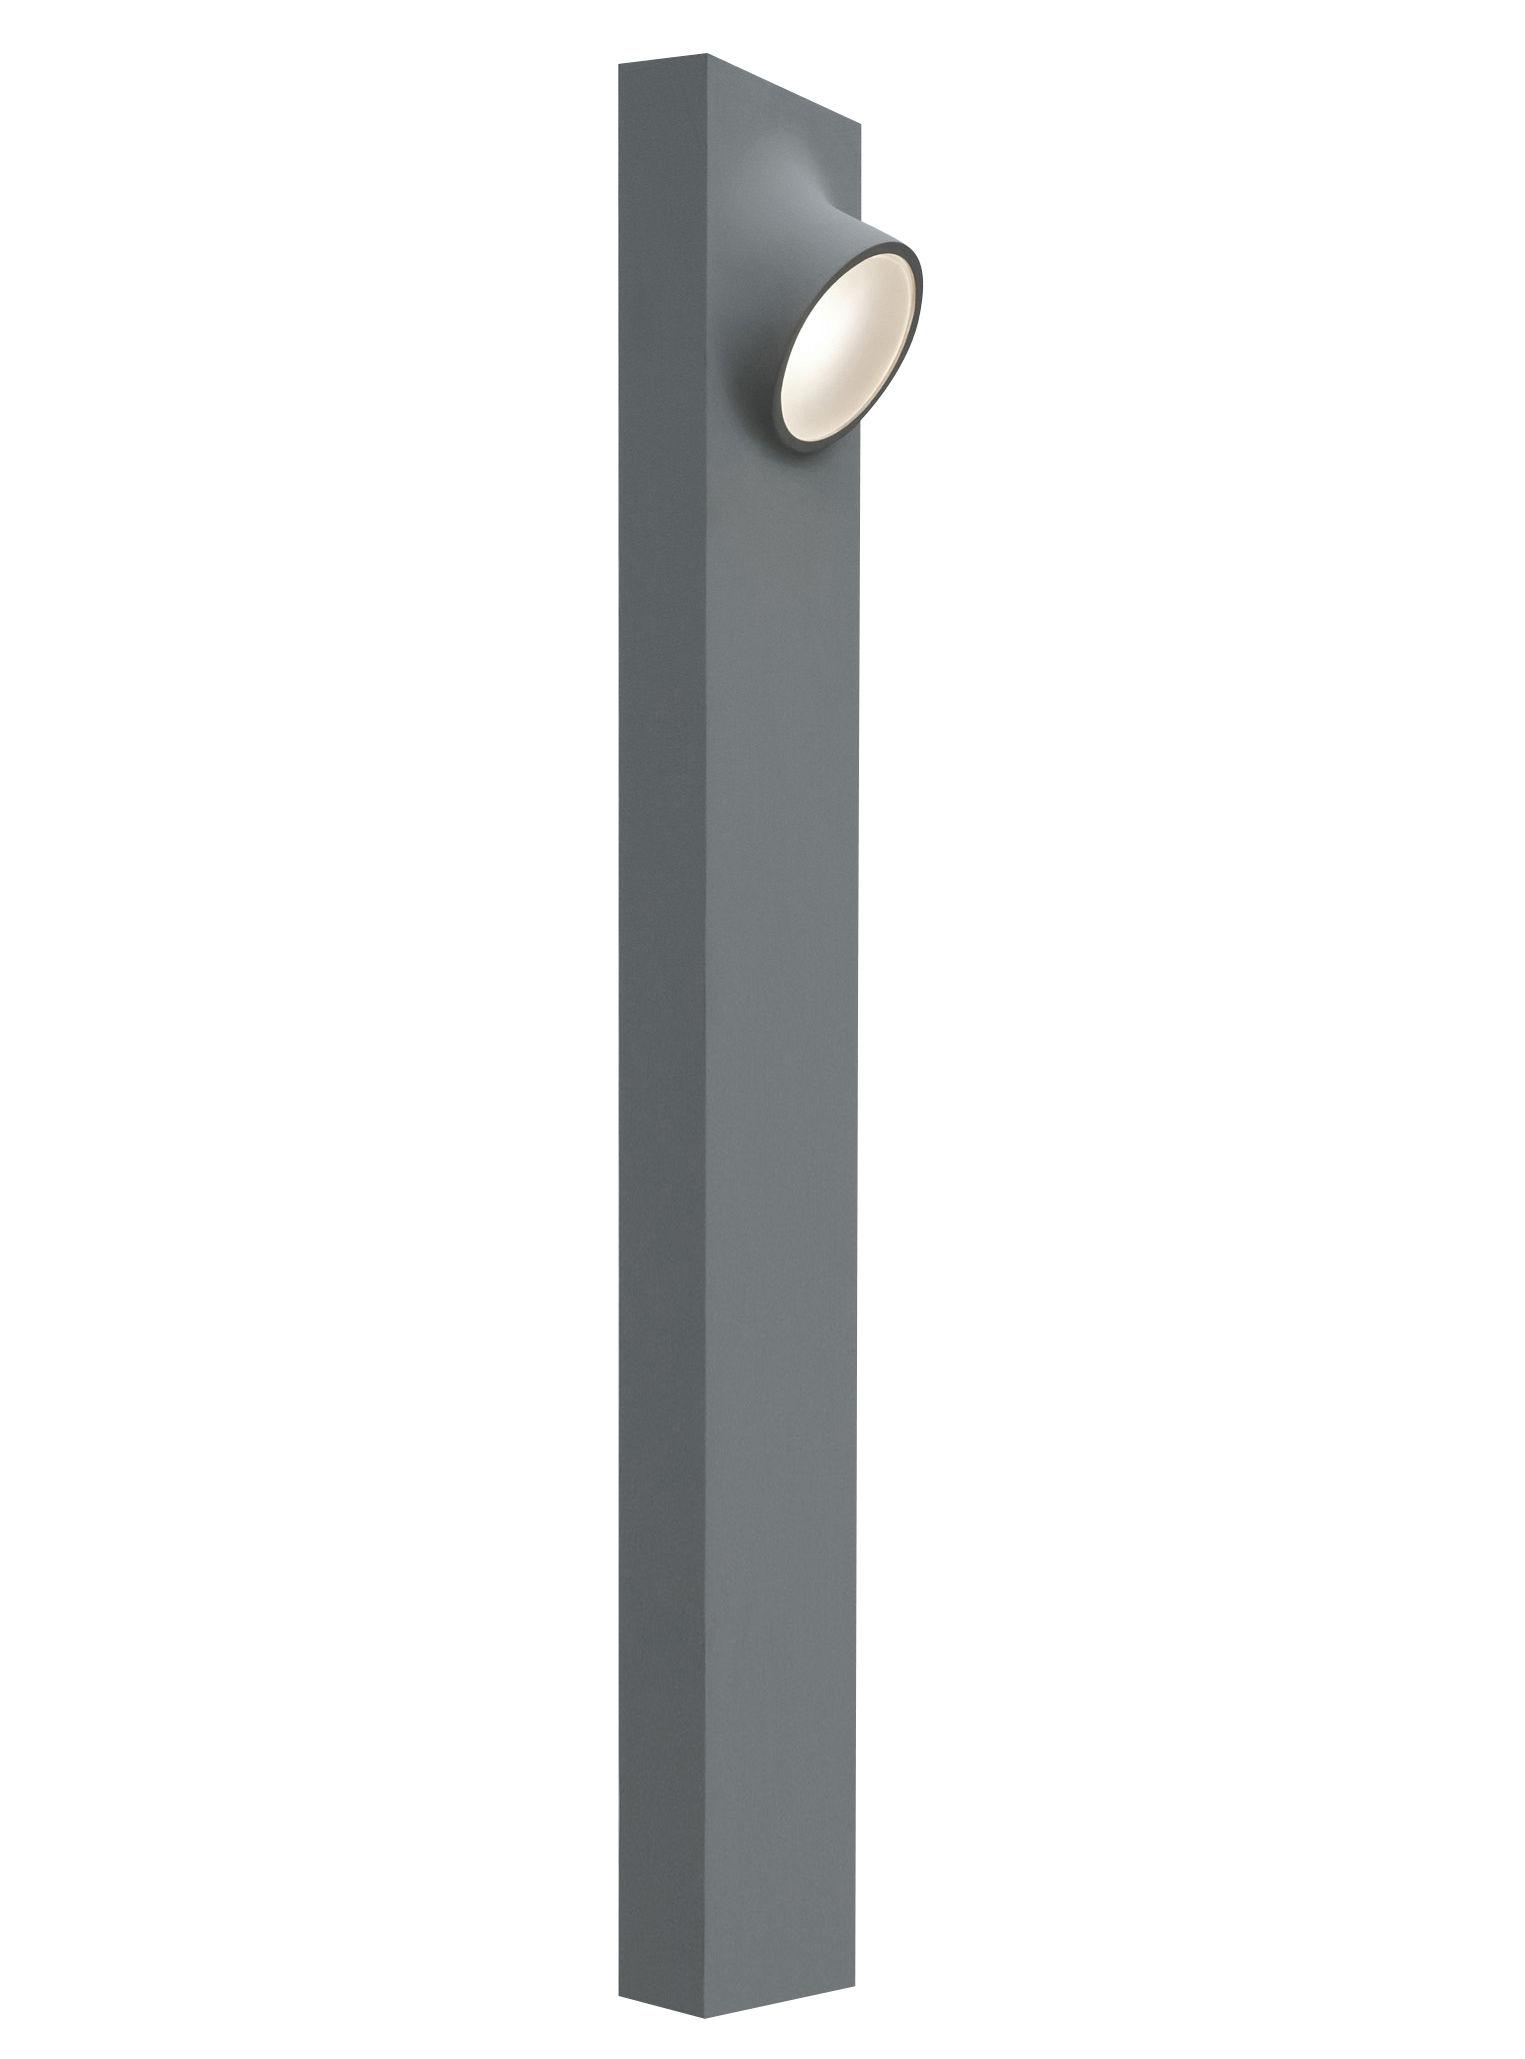 Lighting - Outdoor Lighting - Ciclope Double LED Floor lamp - / outdoor - H 90 cm by Artemide - Grey - H 90 cm - Galvanized aluminium